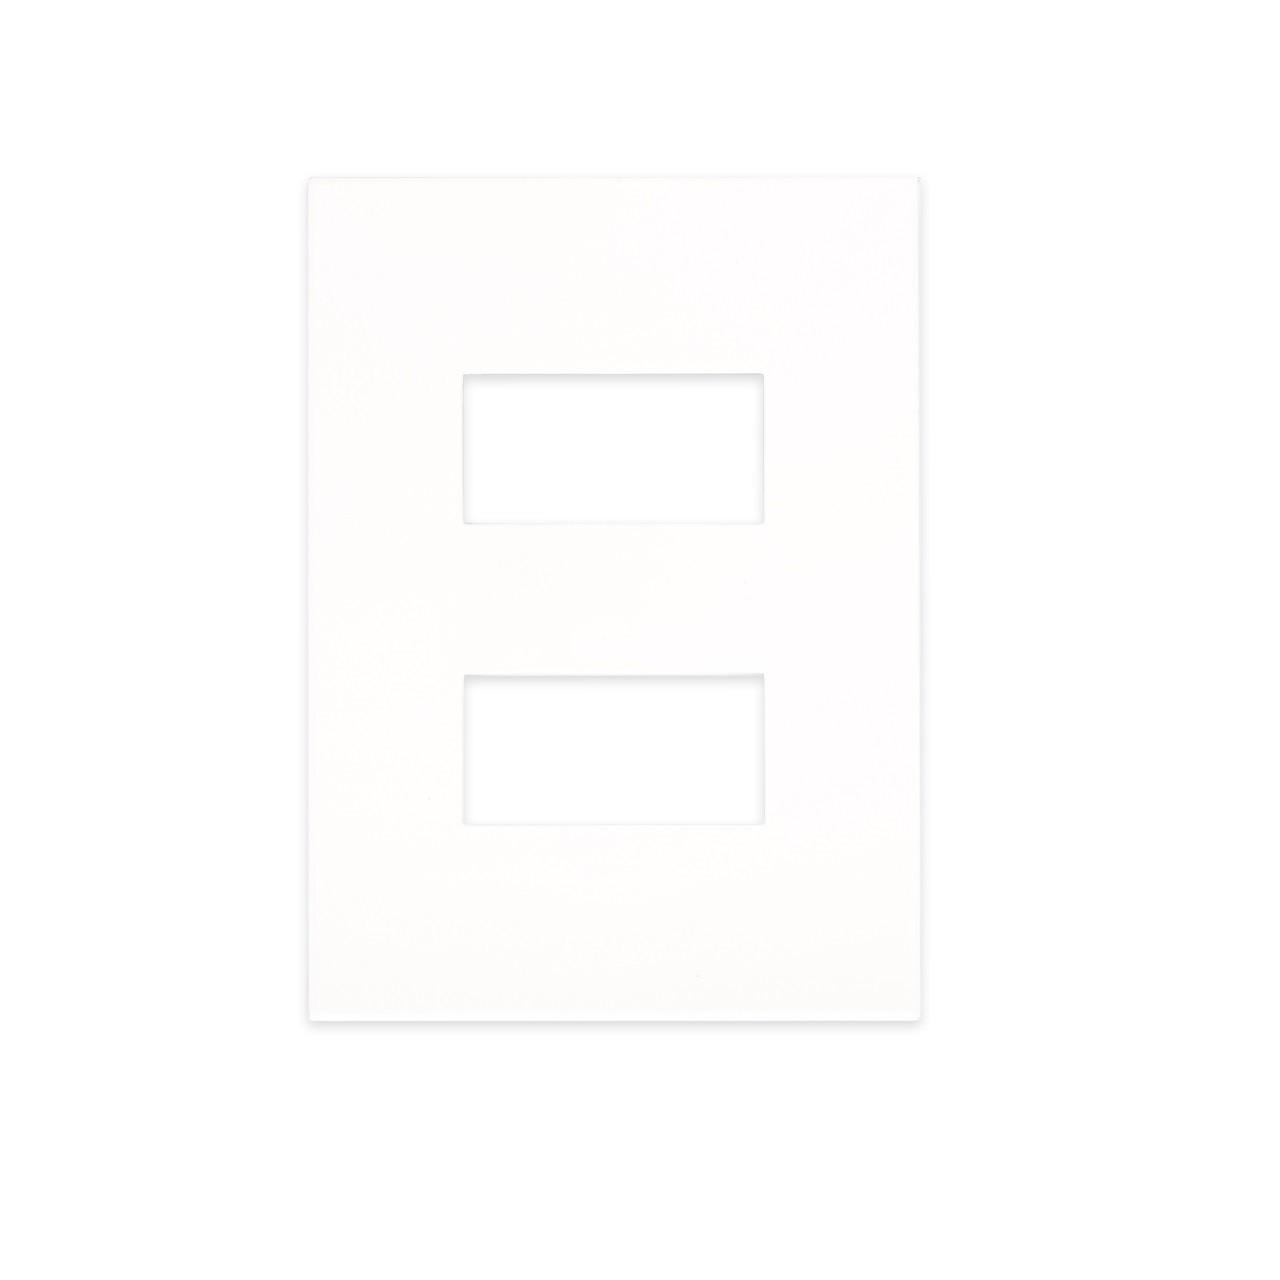 Placa 4 x 2 Retangular 1 1 Posto Separado Branco - Arteor - Legrand